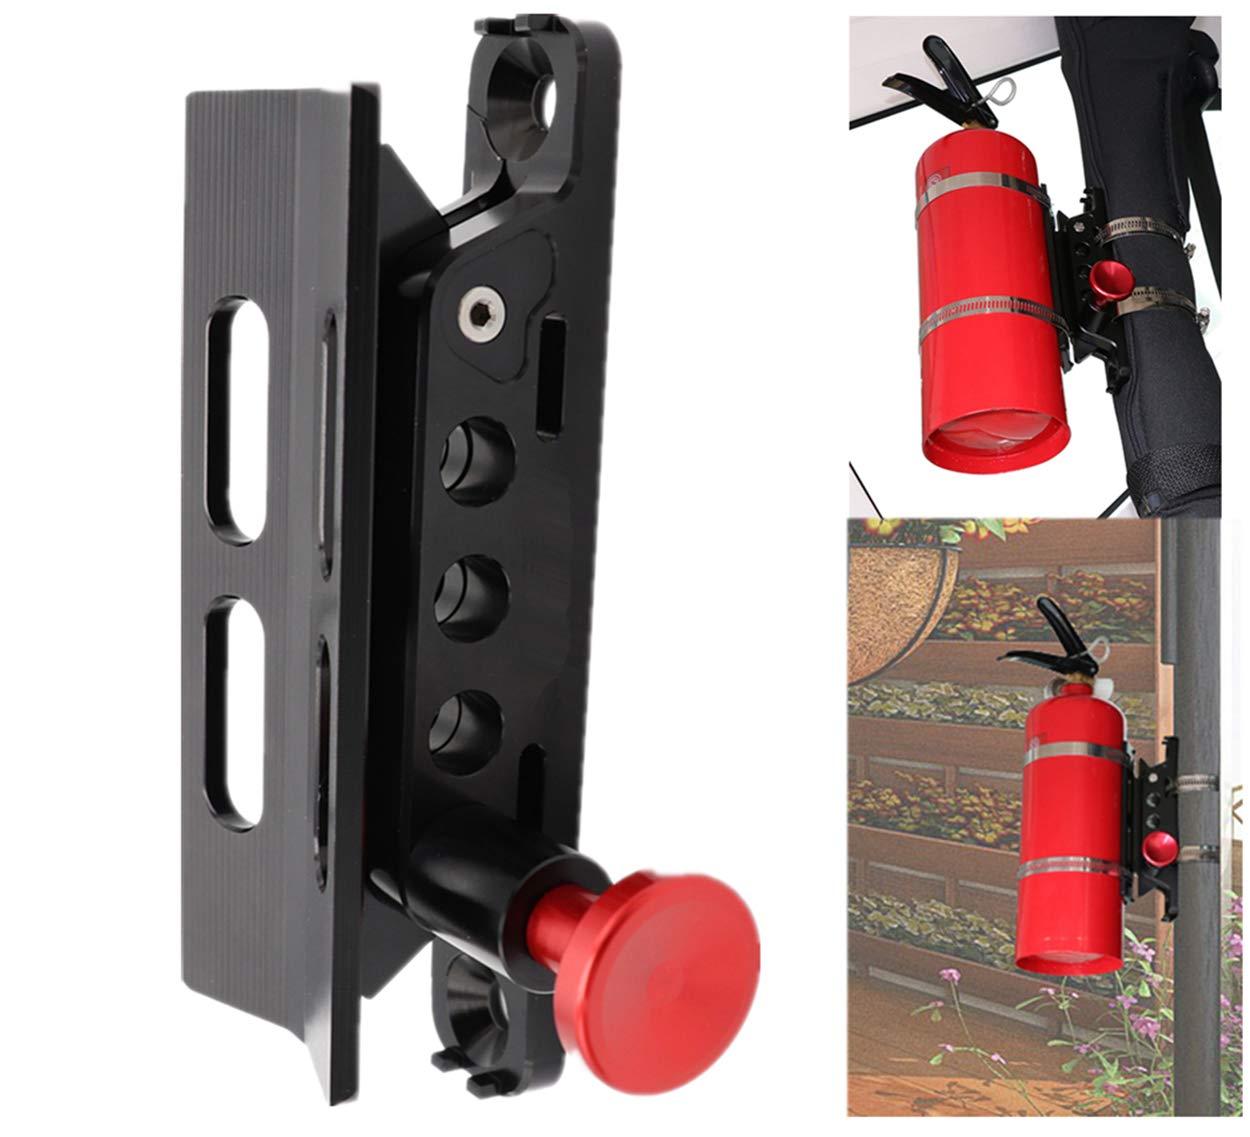 AUFER Vehicle Universal Roll Bar Bottle/Fire Extinguisher Holder Mount,Adjustable, Aluminum by AUFER